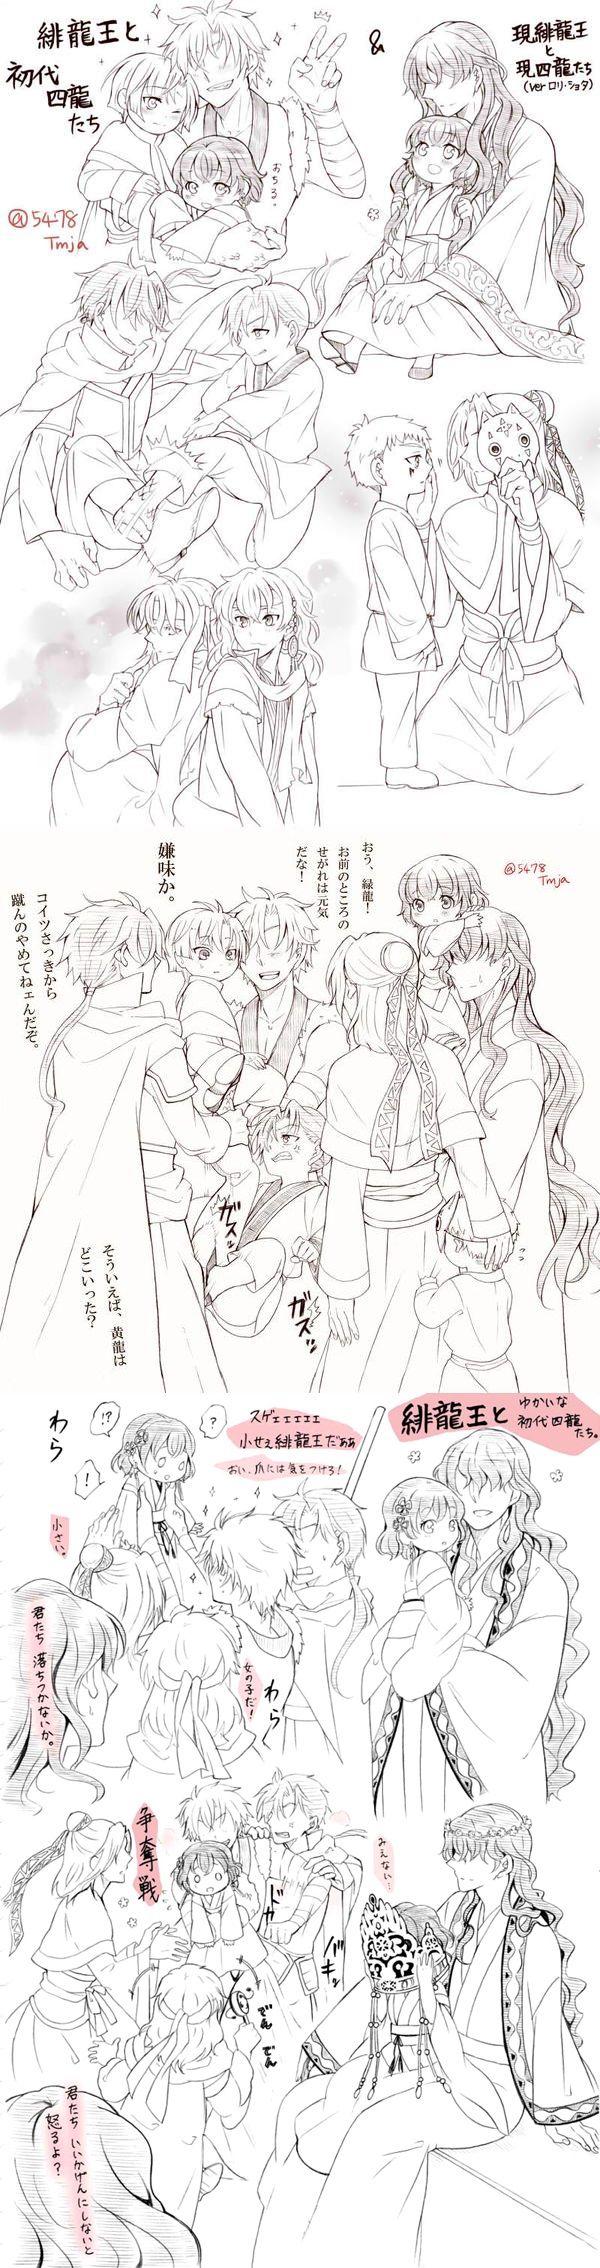 Little Yona, Kija, Shin-ah, and Jae-ha with Zeno. Gu-En, Abi, Shu-Ten and King Hiryuu